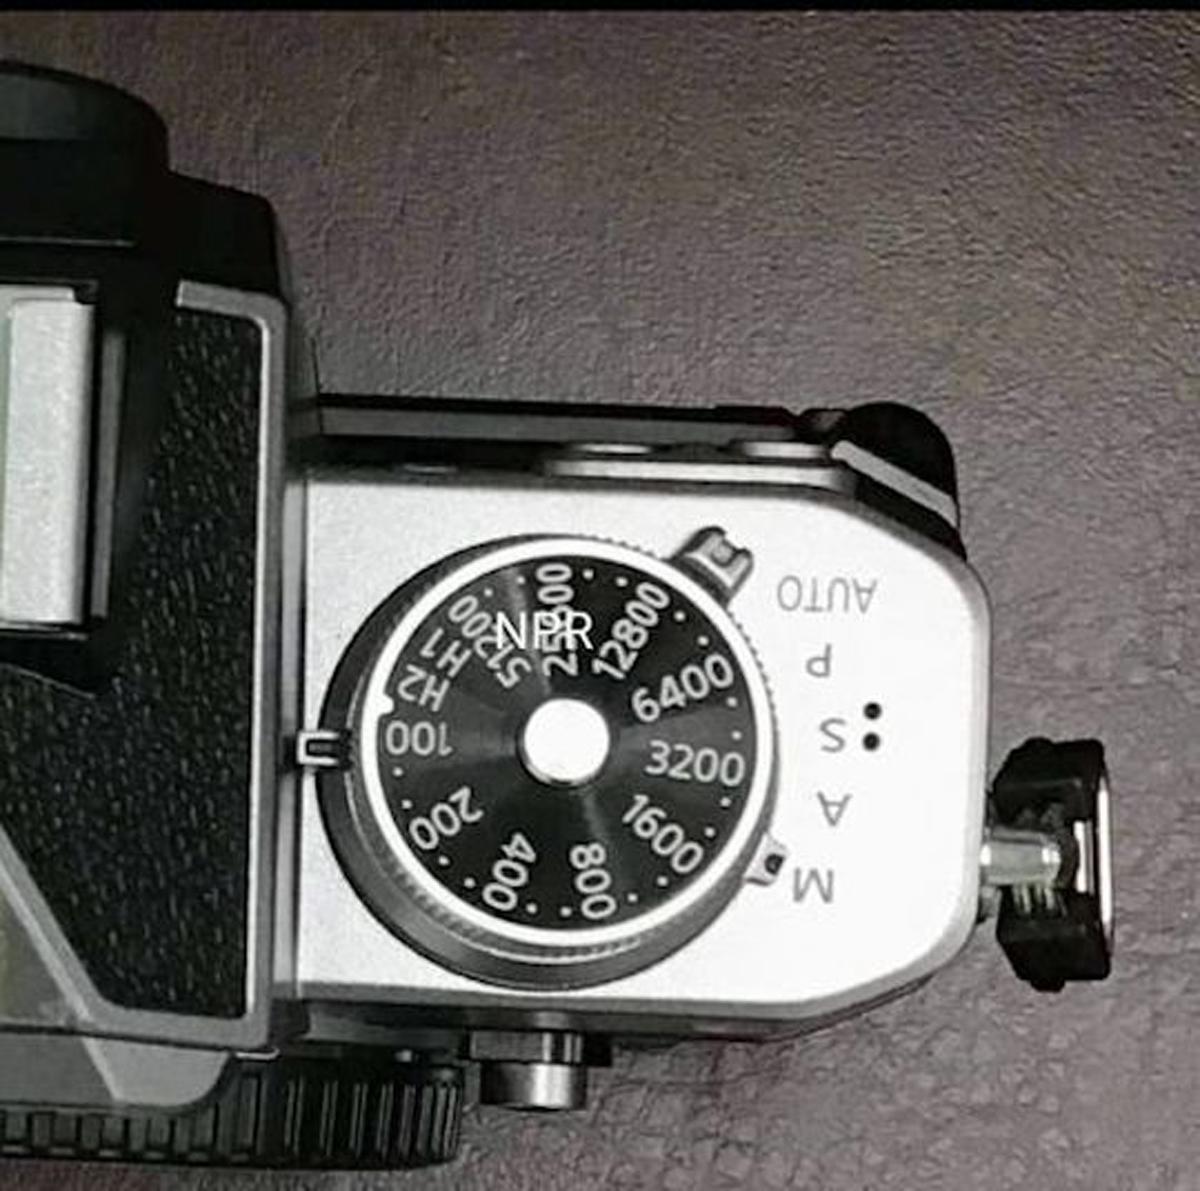 Nikon ZFC retro inspired camera launching soon leak